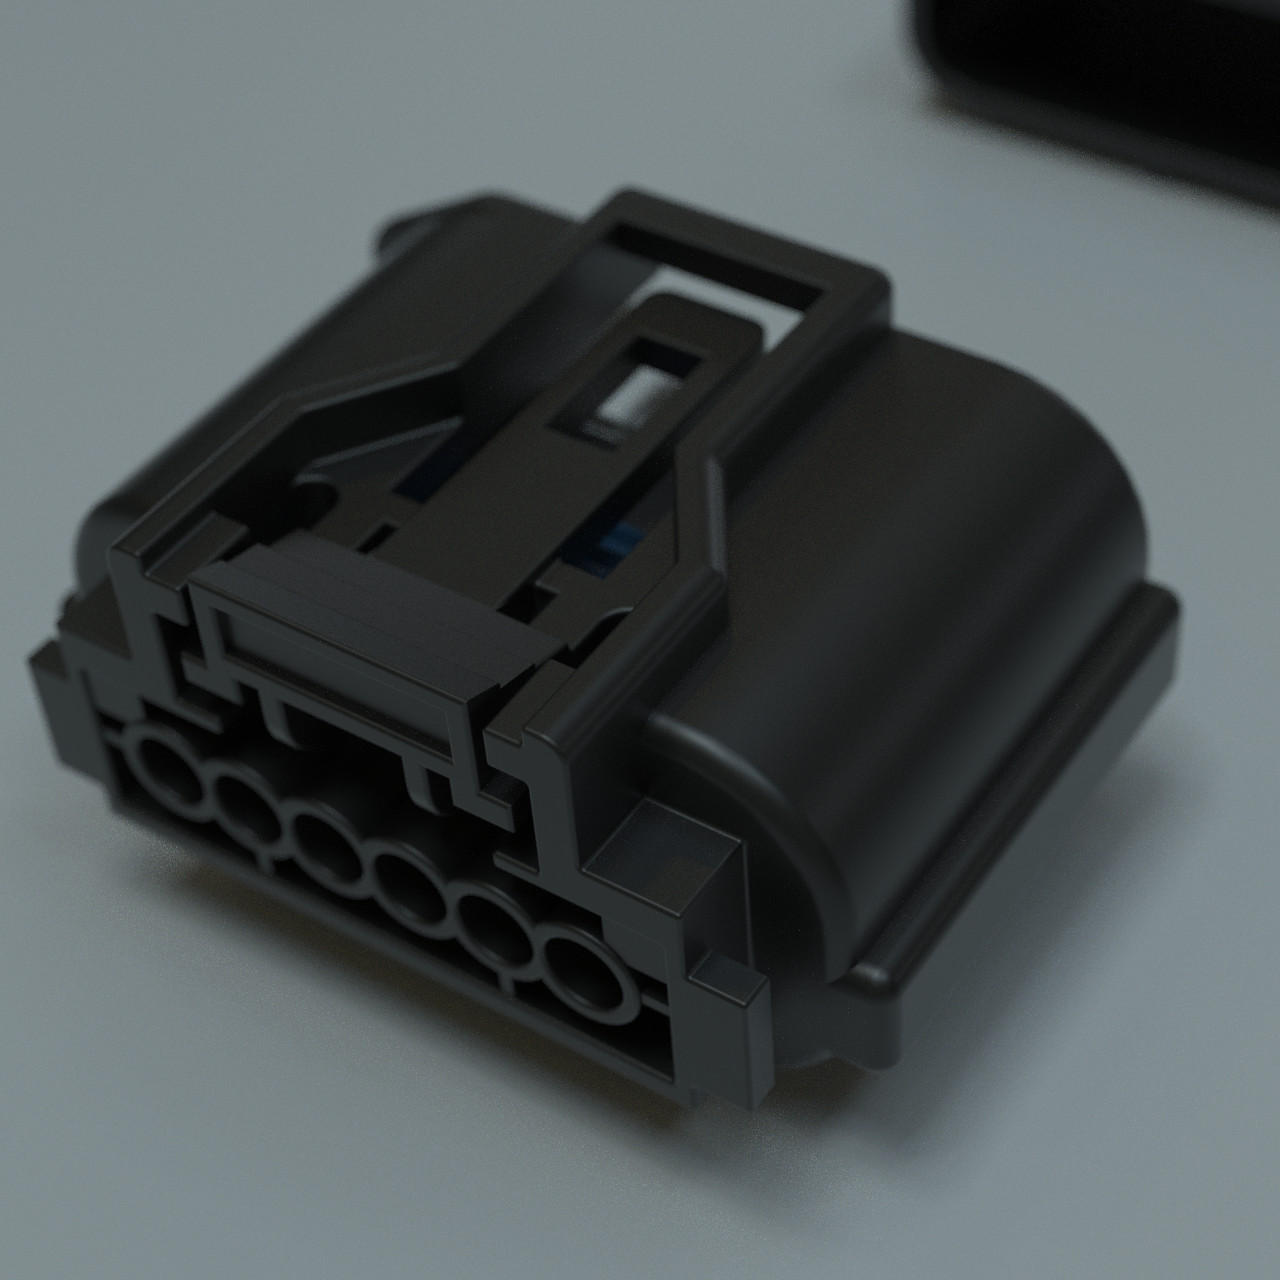 Cem tezcan wip10